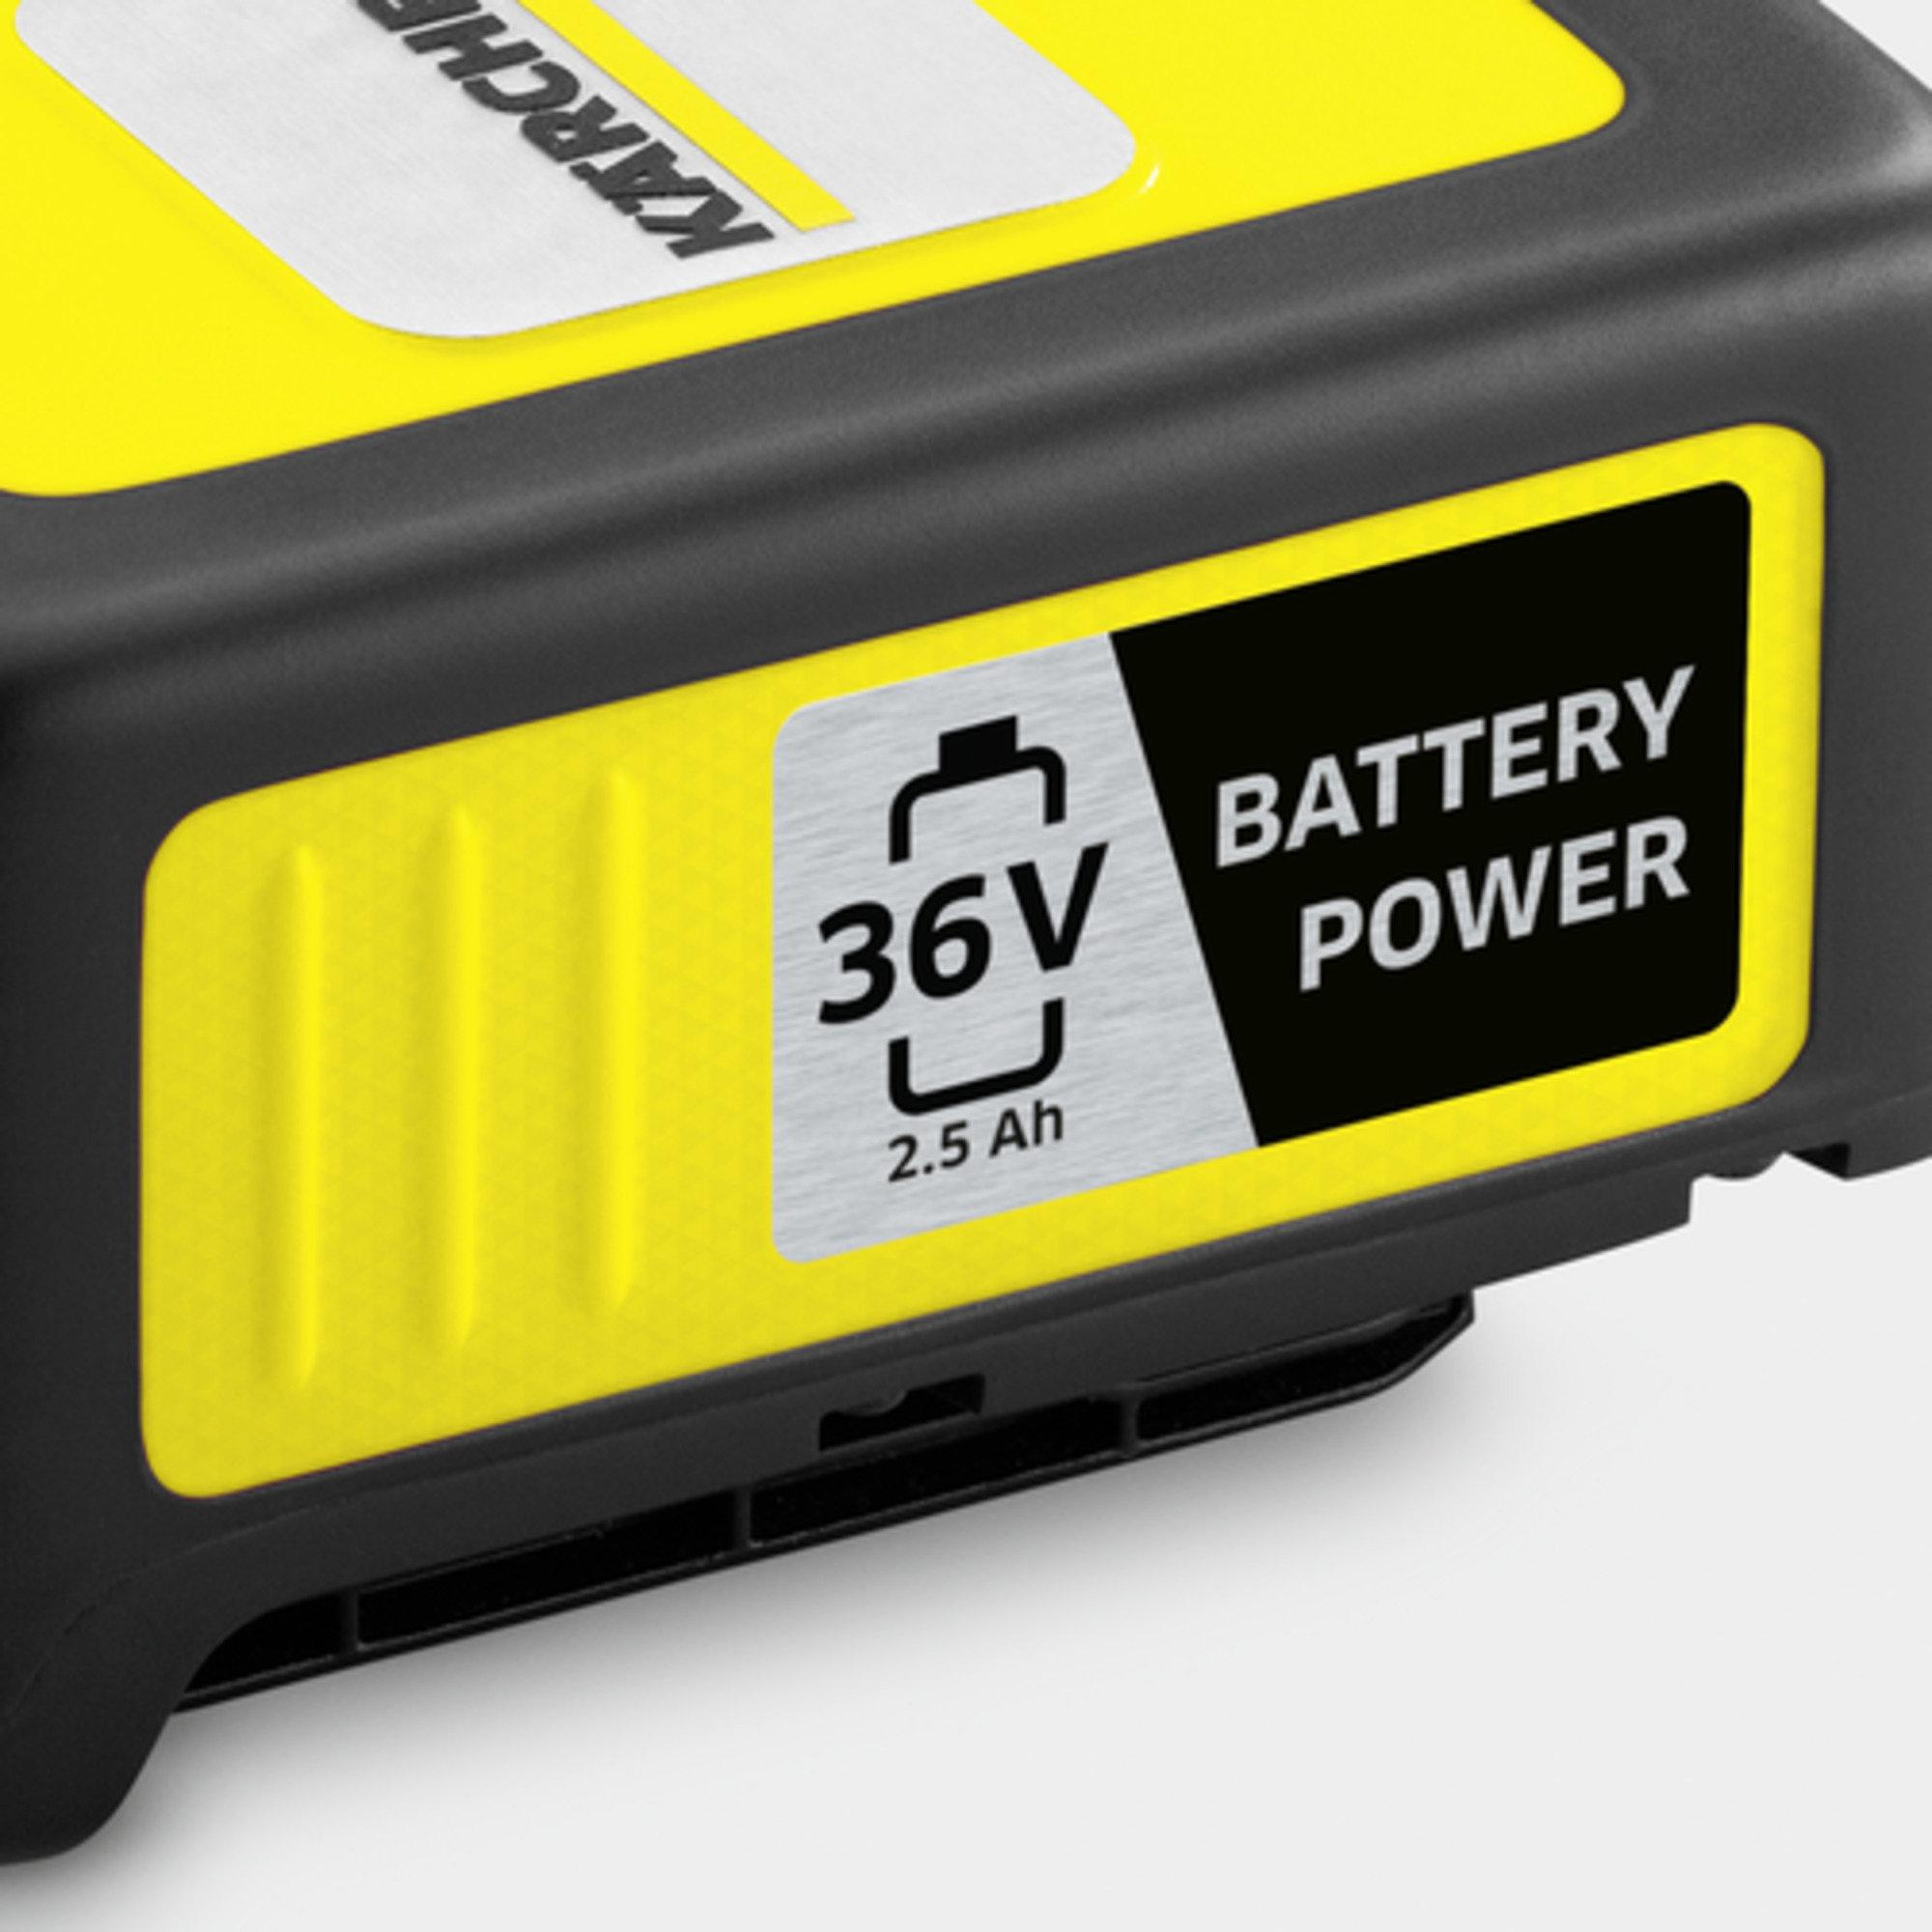 Battery power vahetatav aku 36/25: Kärcheri 36 V akuplatvorm